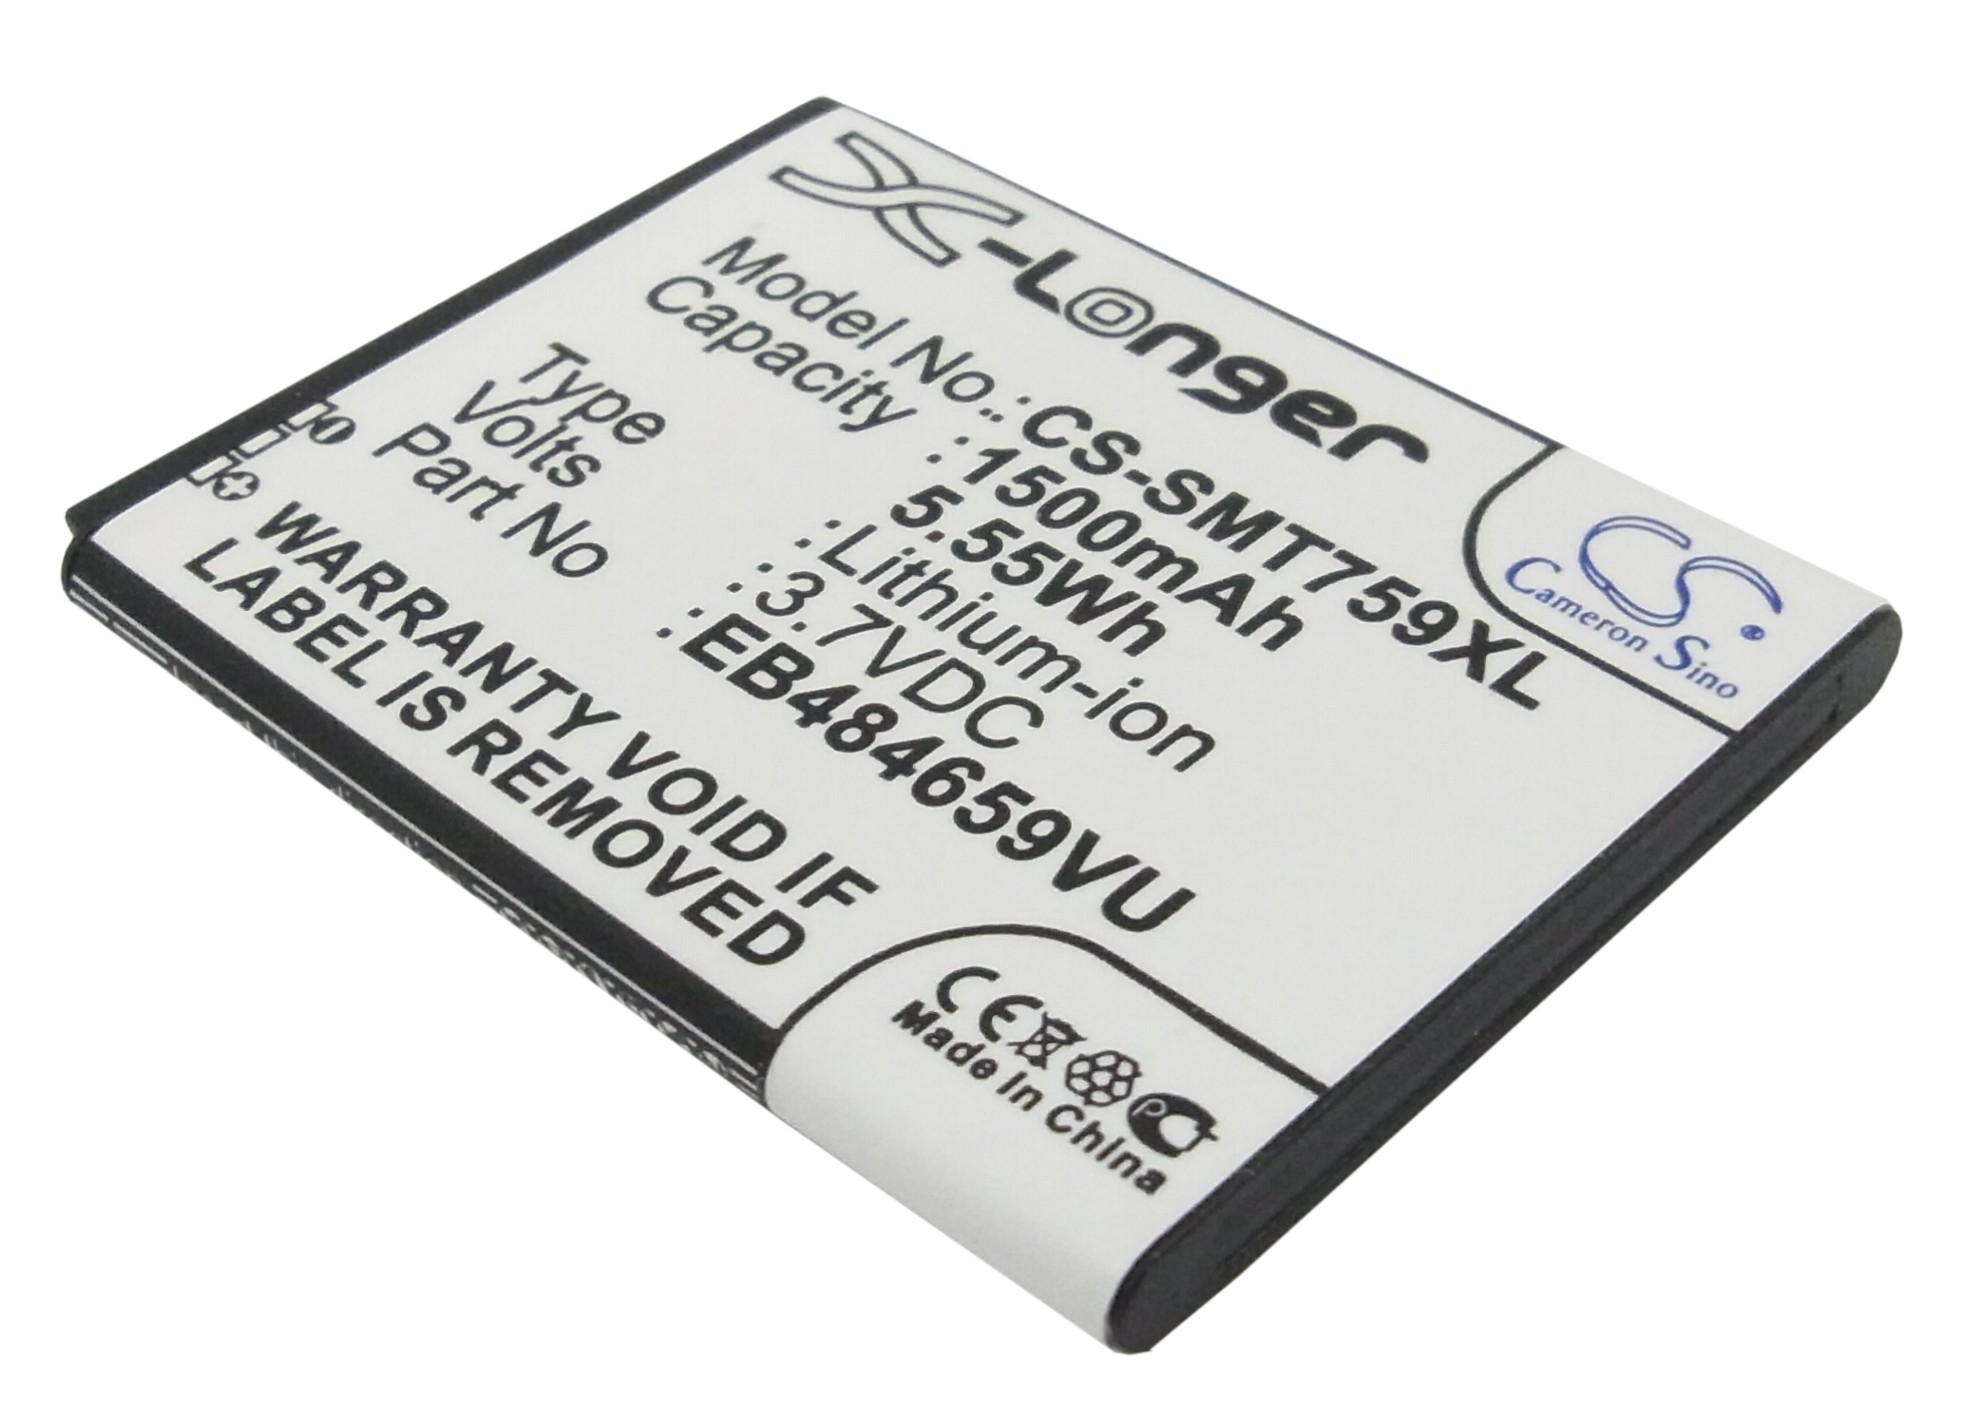 Cameron Sino baterie do mobilů pro SAMSUNG GT-I8150 3.7V Li-ion 1500mAh černá - neoriginální